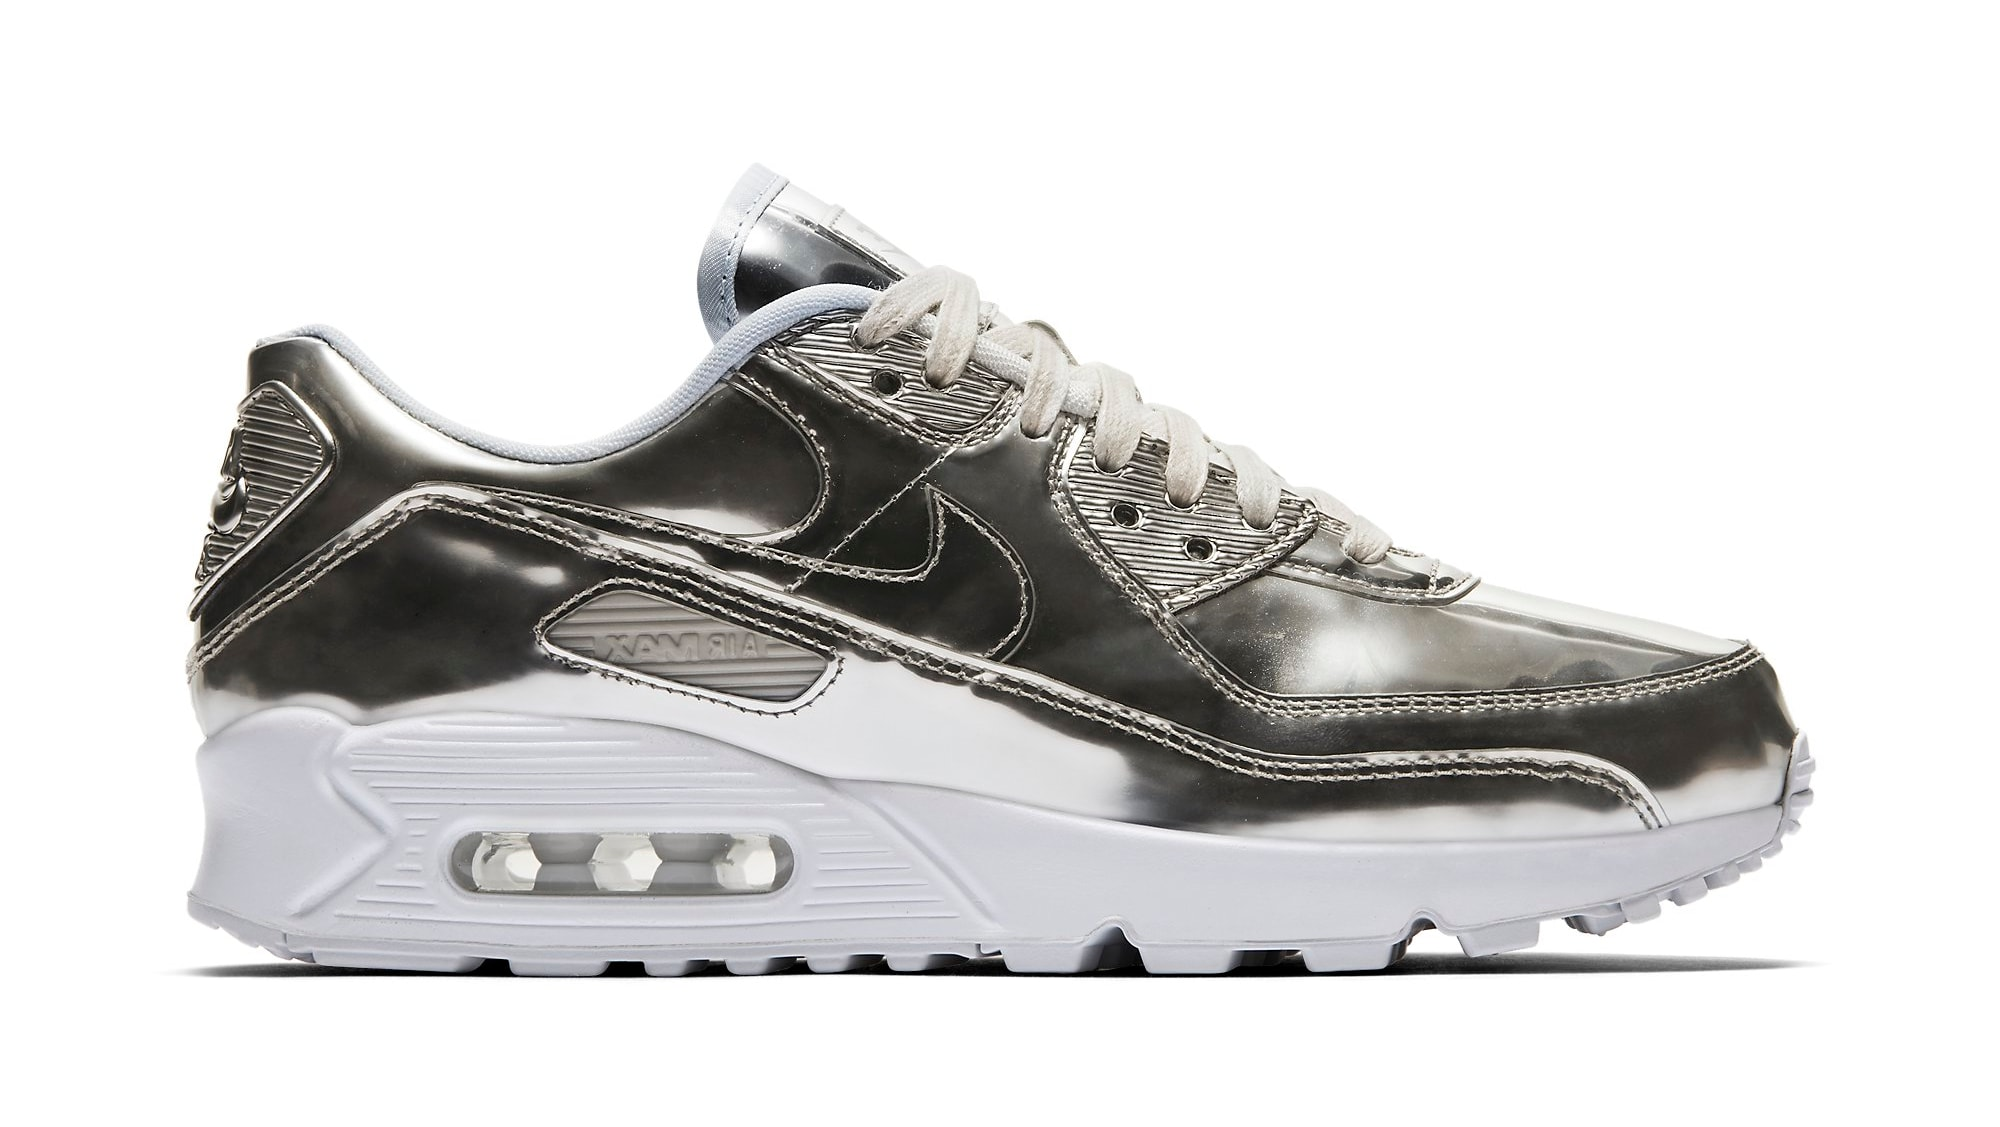 nike-air-max-90-metallic-pack-silver-cq6639-001-release-date